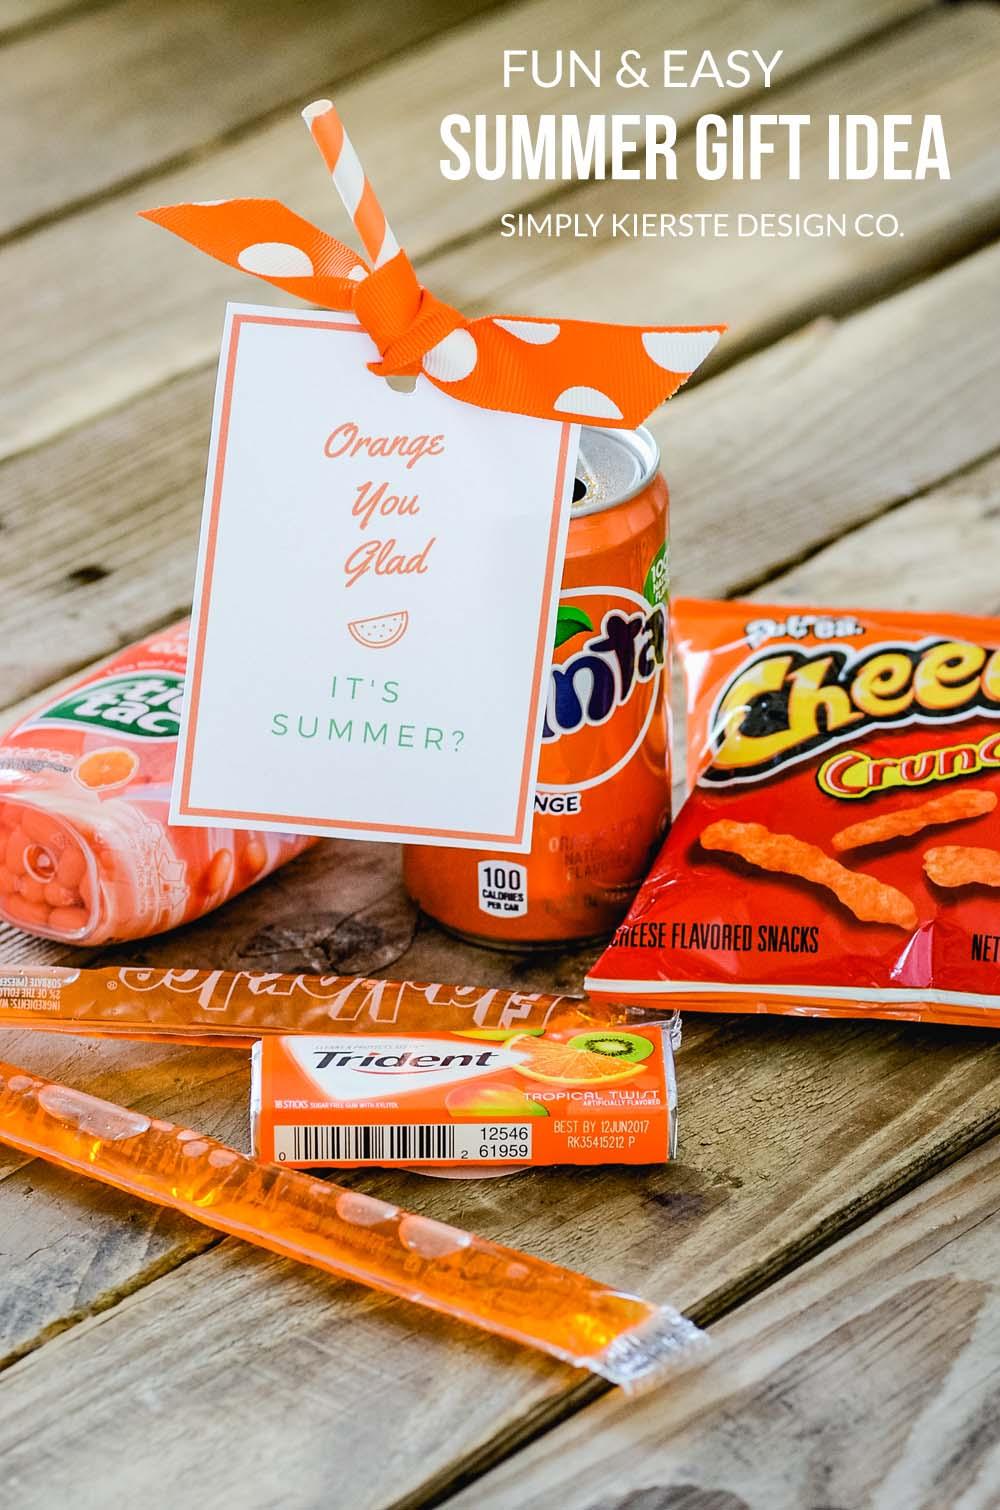 Orange You Glad It's Summer | Summer Gift Idea